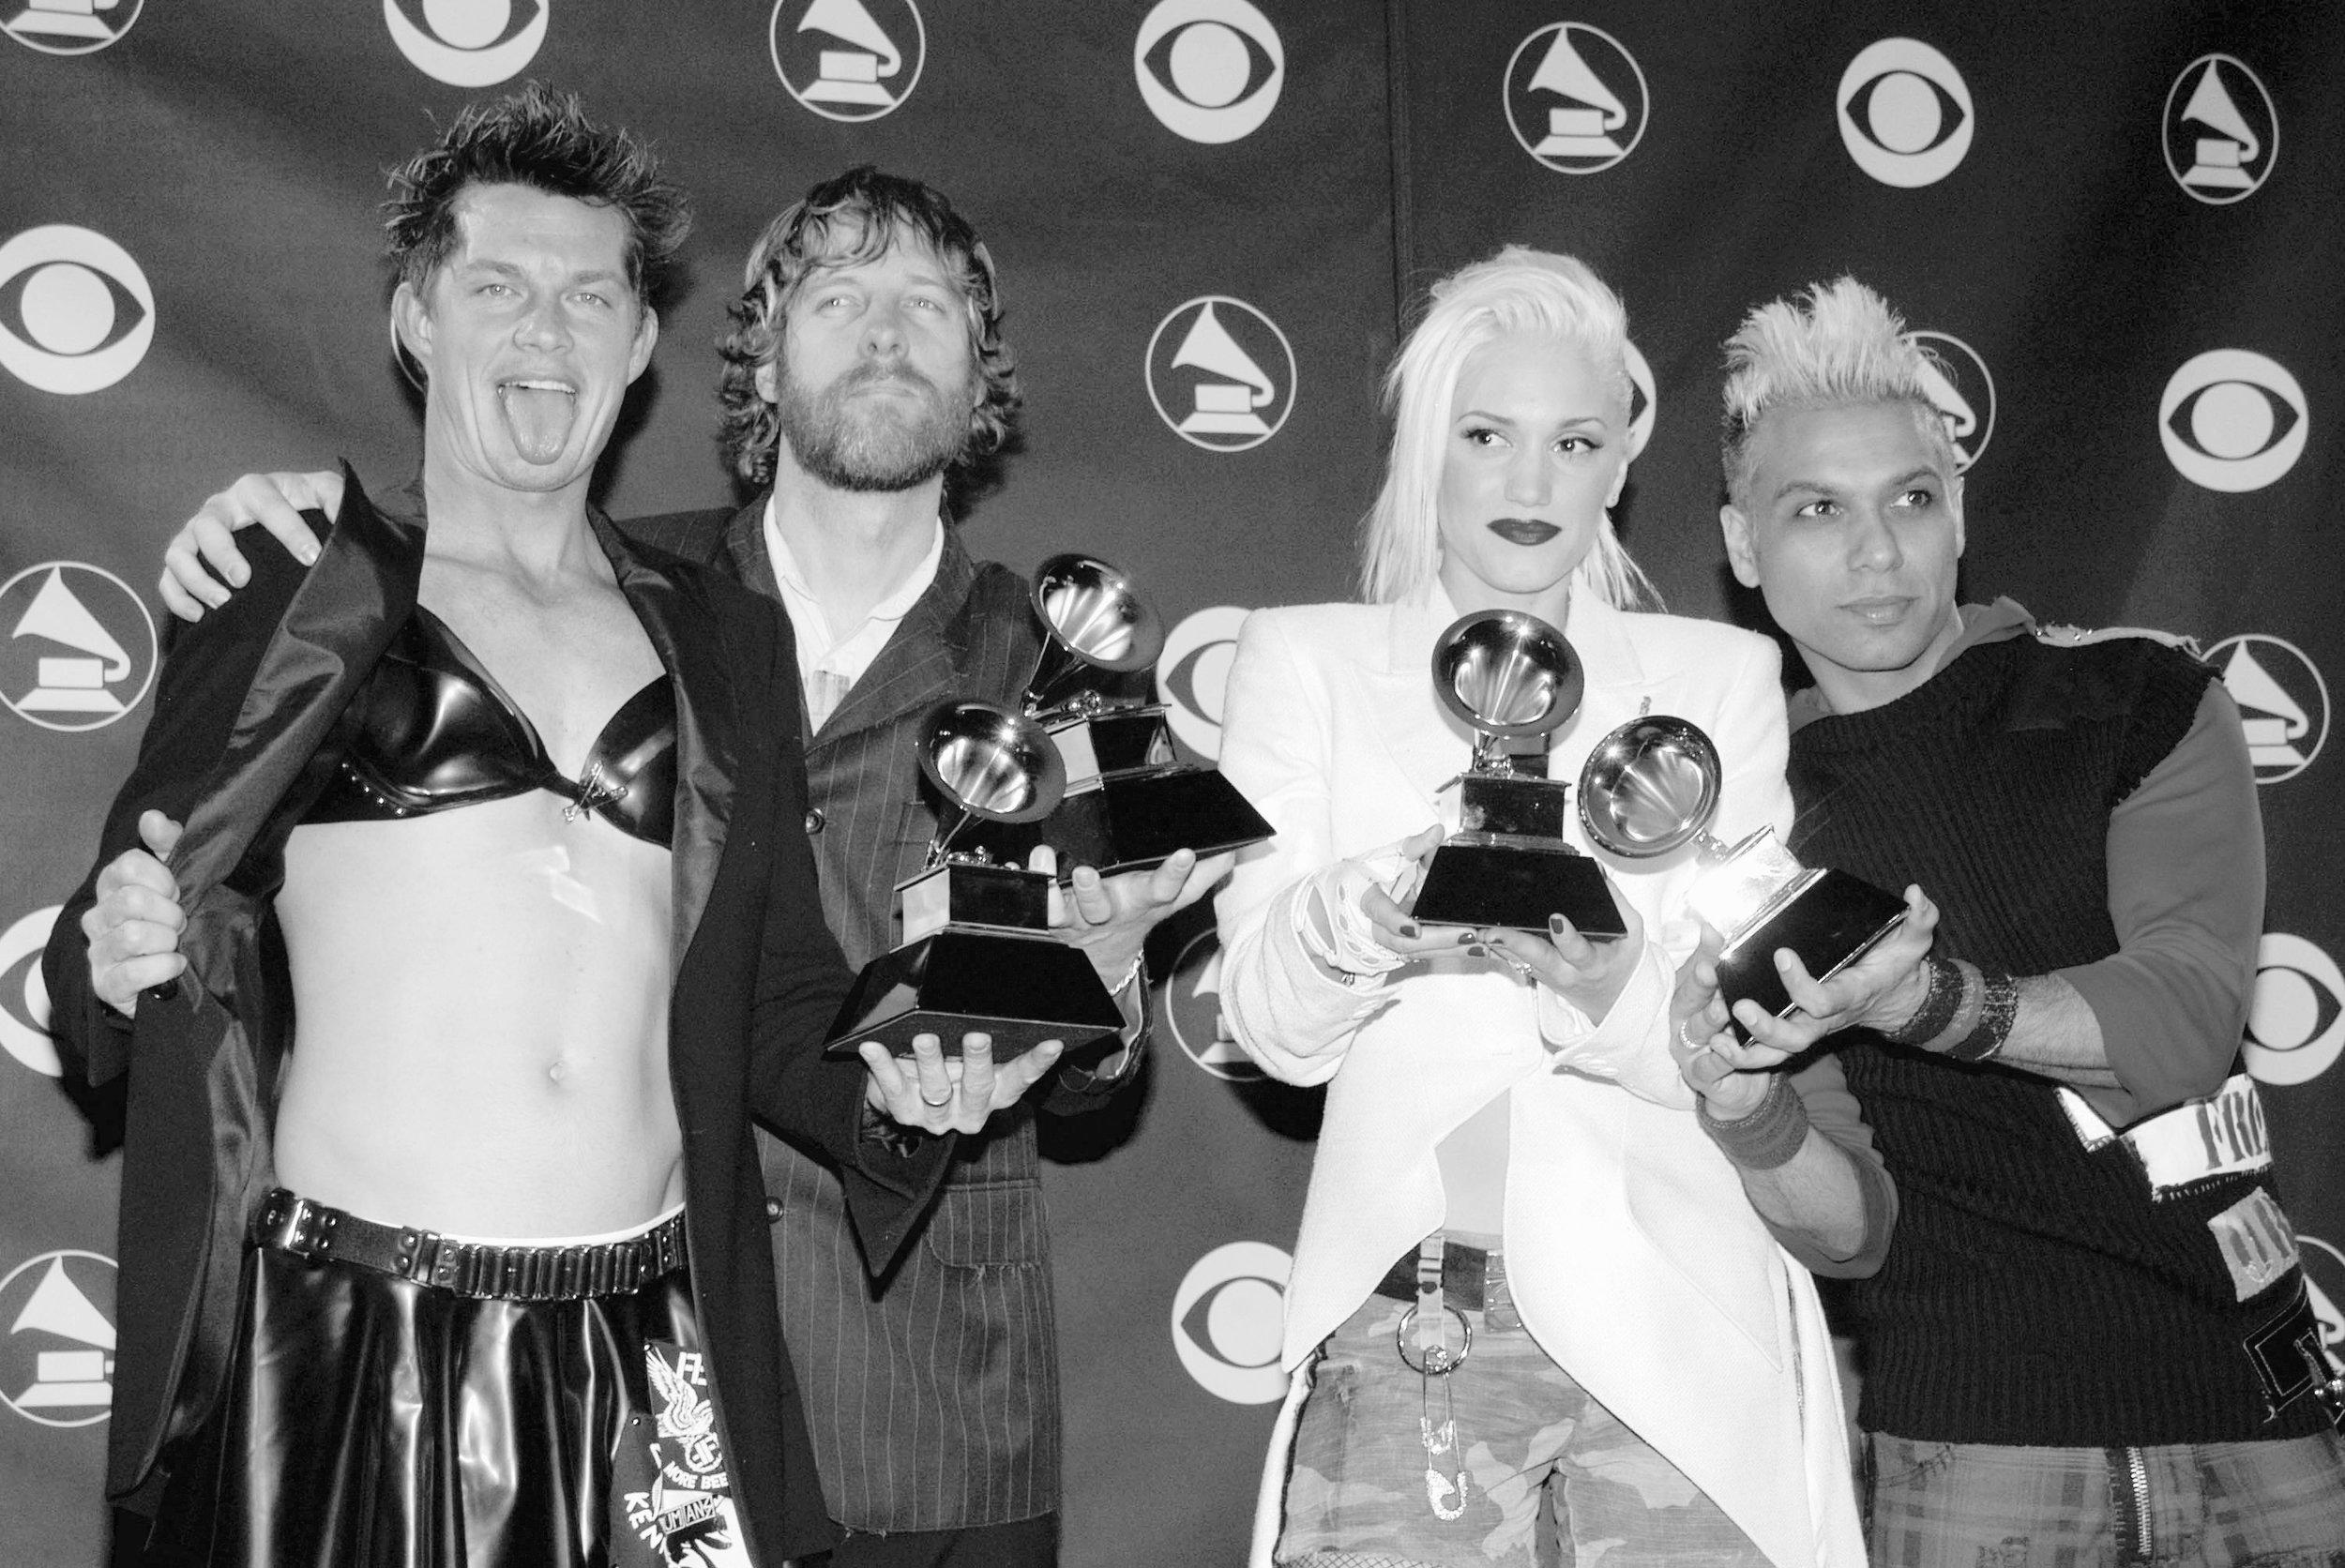 Grammy Awards - Feb 23, 2003